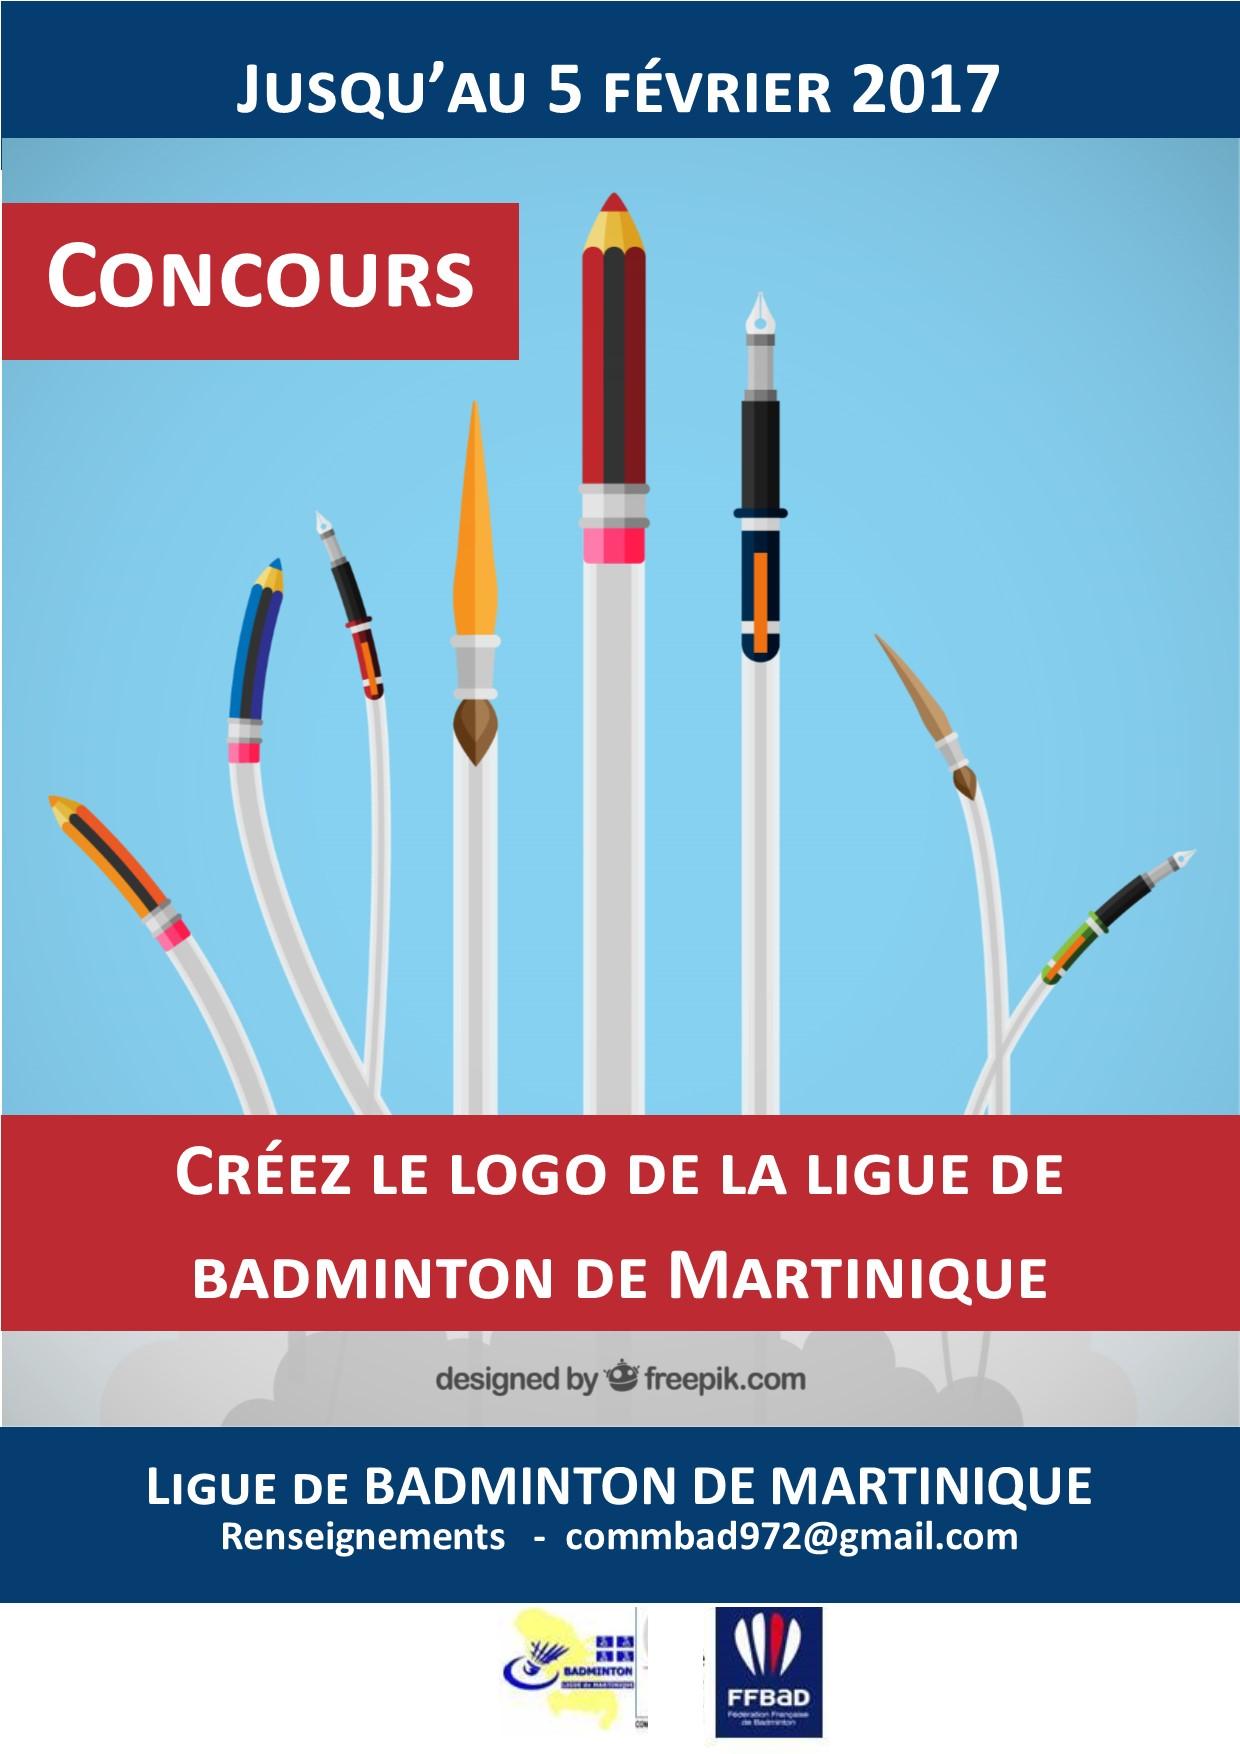 Concours logo badminton martinique